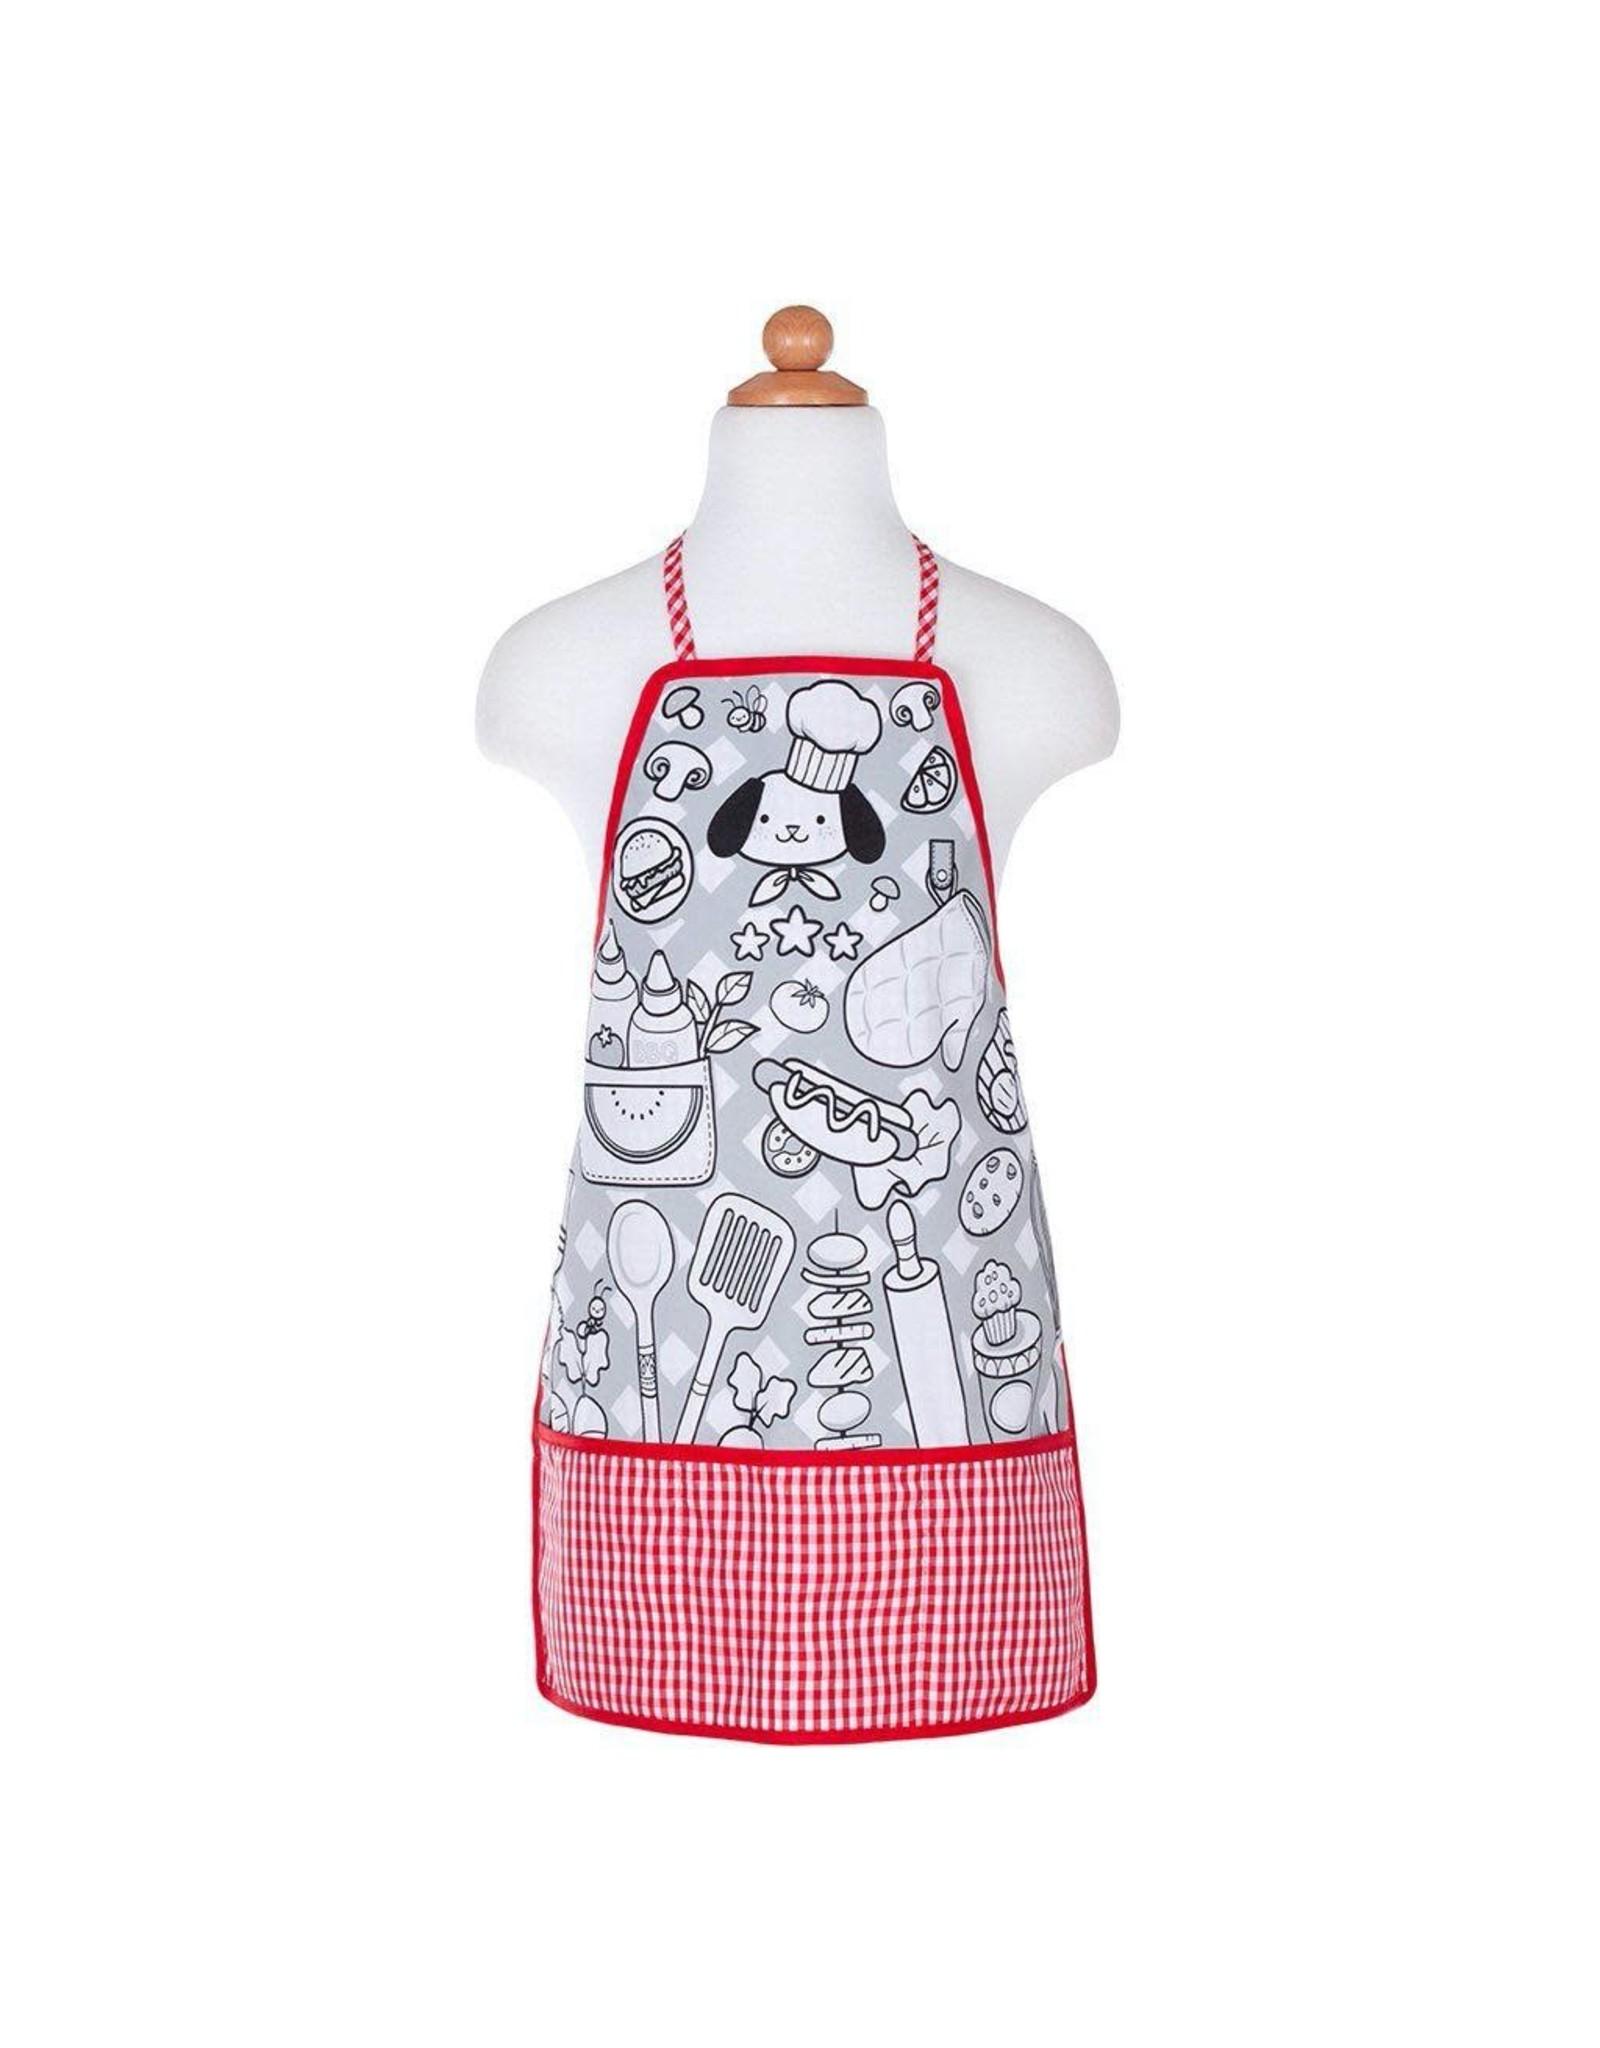 Great Pretenders Colour-An-Apron Chef, Size 4-6